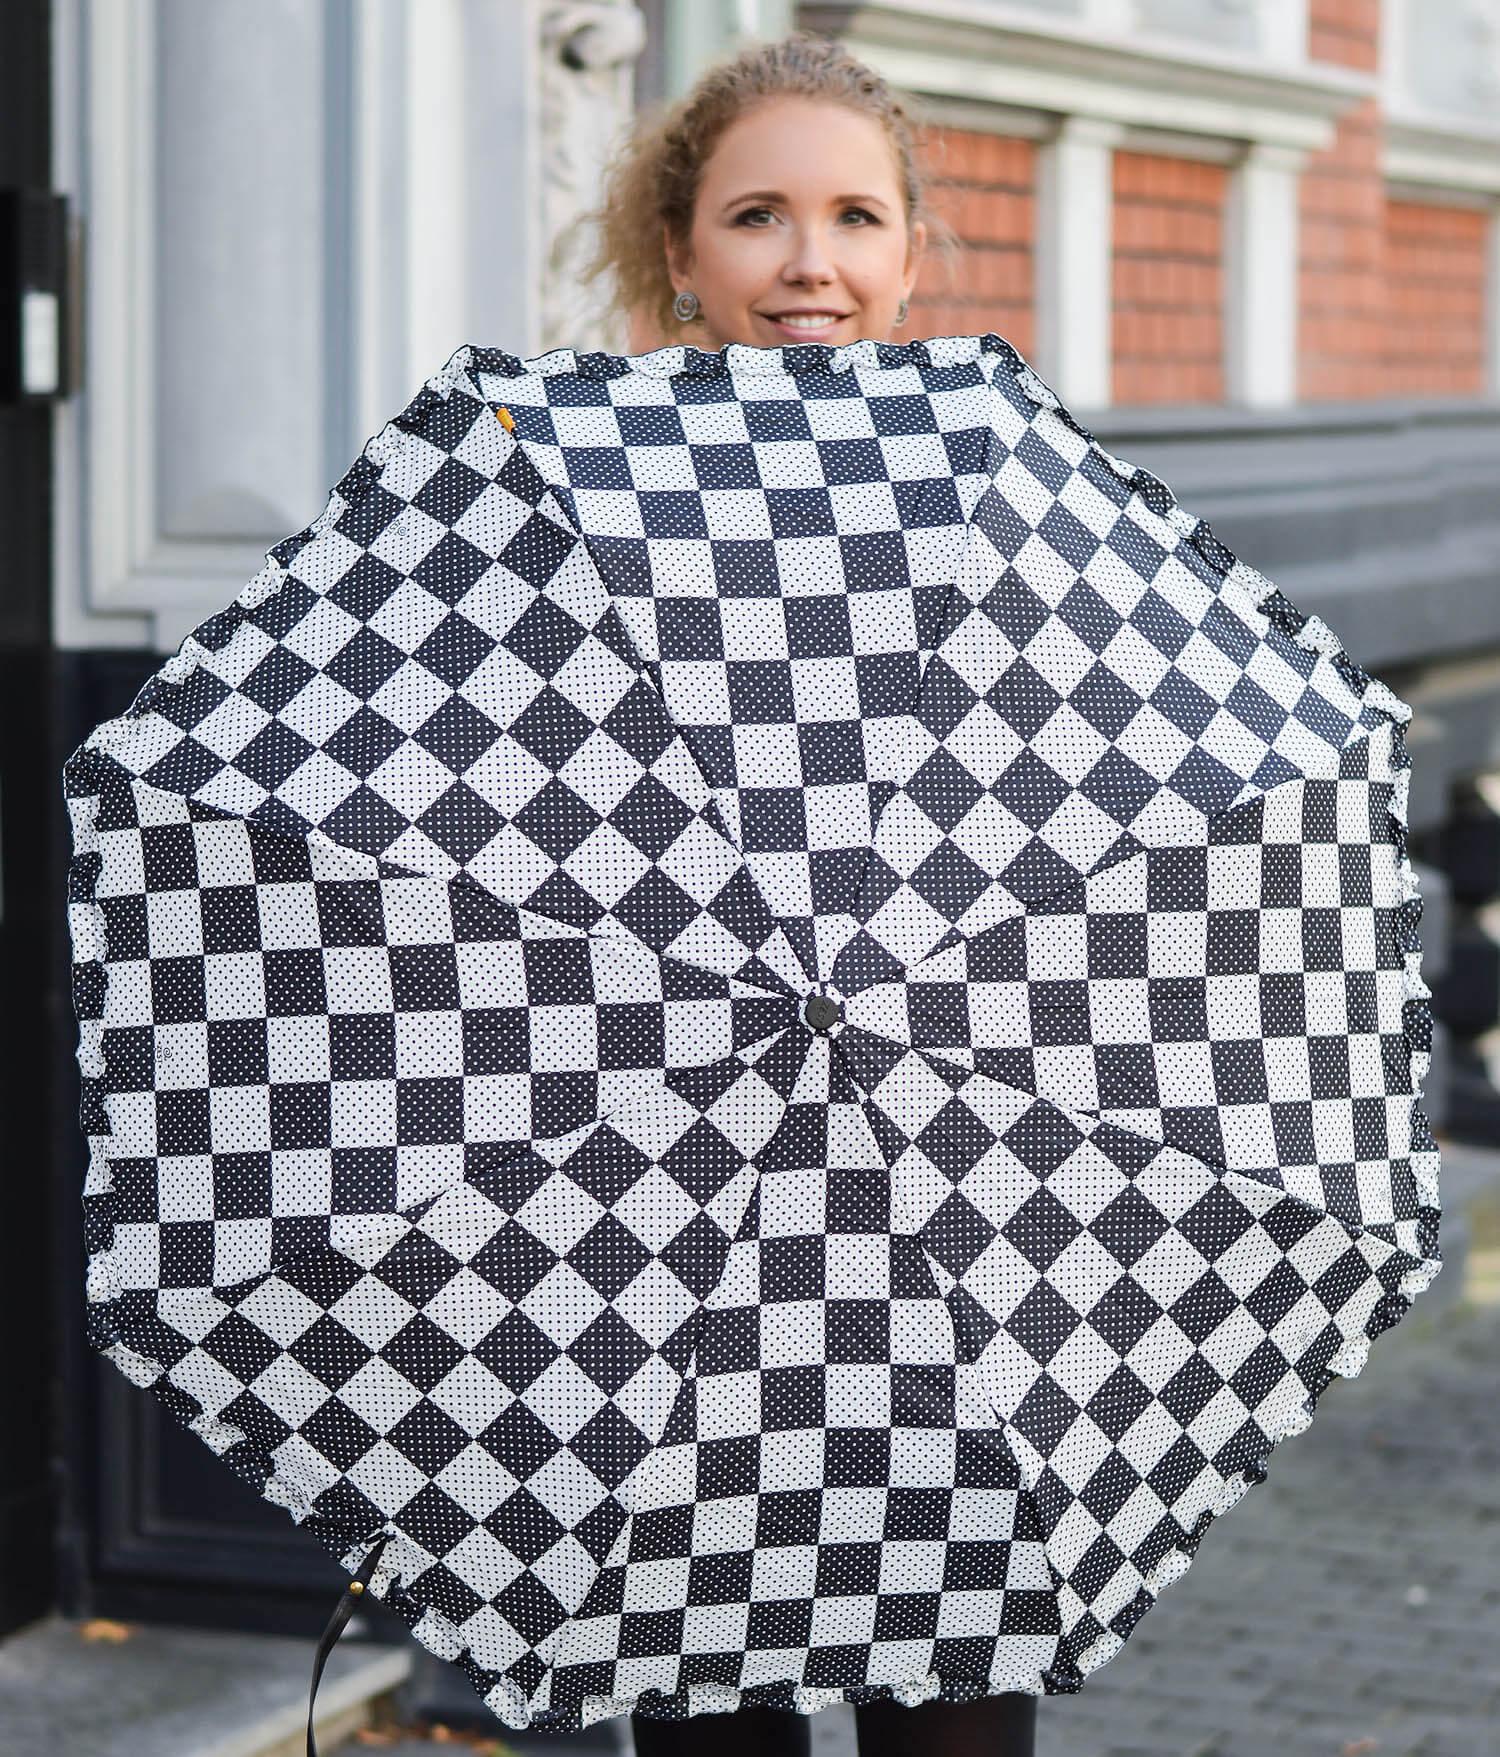 Kationette-fashionblog-nrw-Outfit-Denim-Hotpants-Black-Blouse-Furla-and-new-Pocket-Umbrella-from-Zest